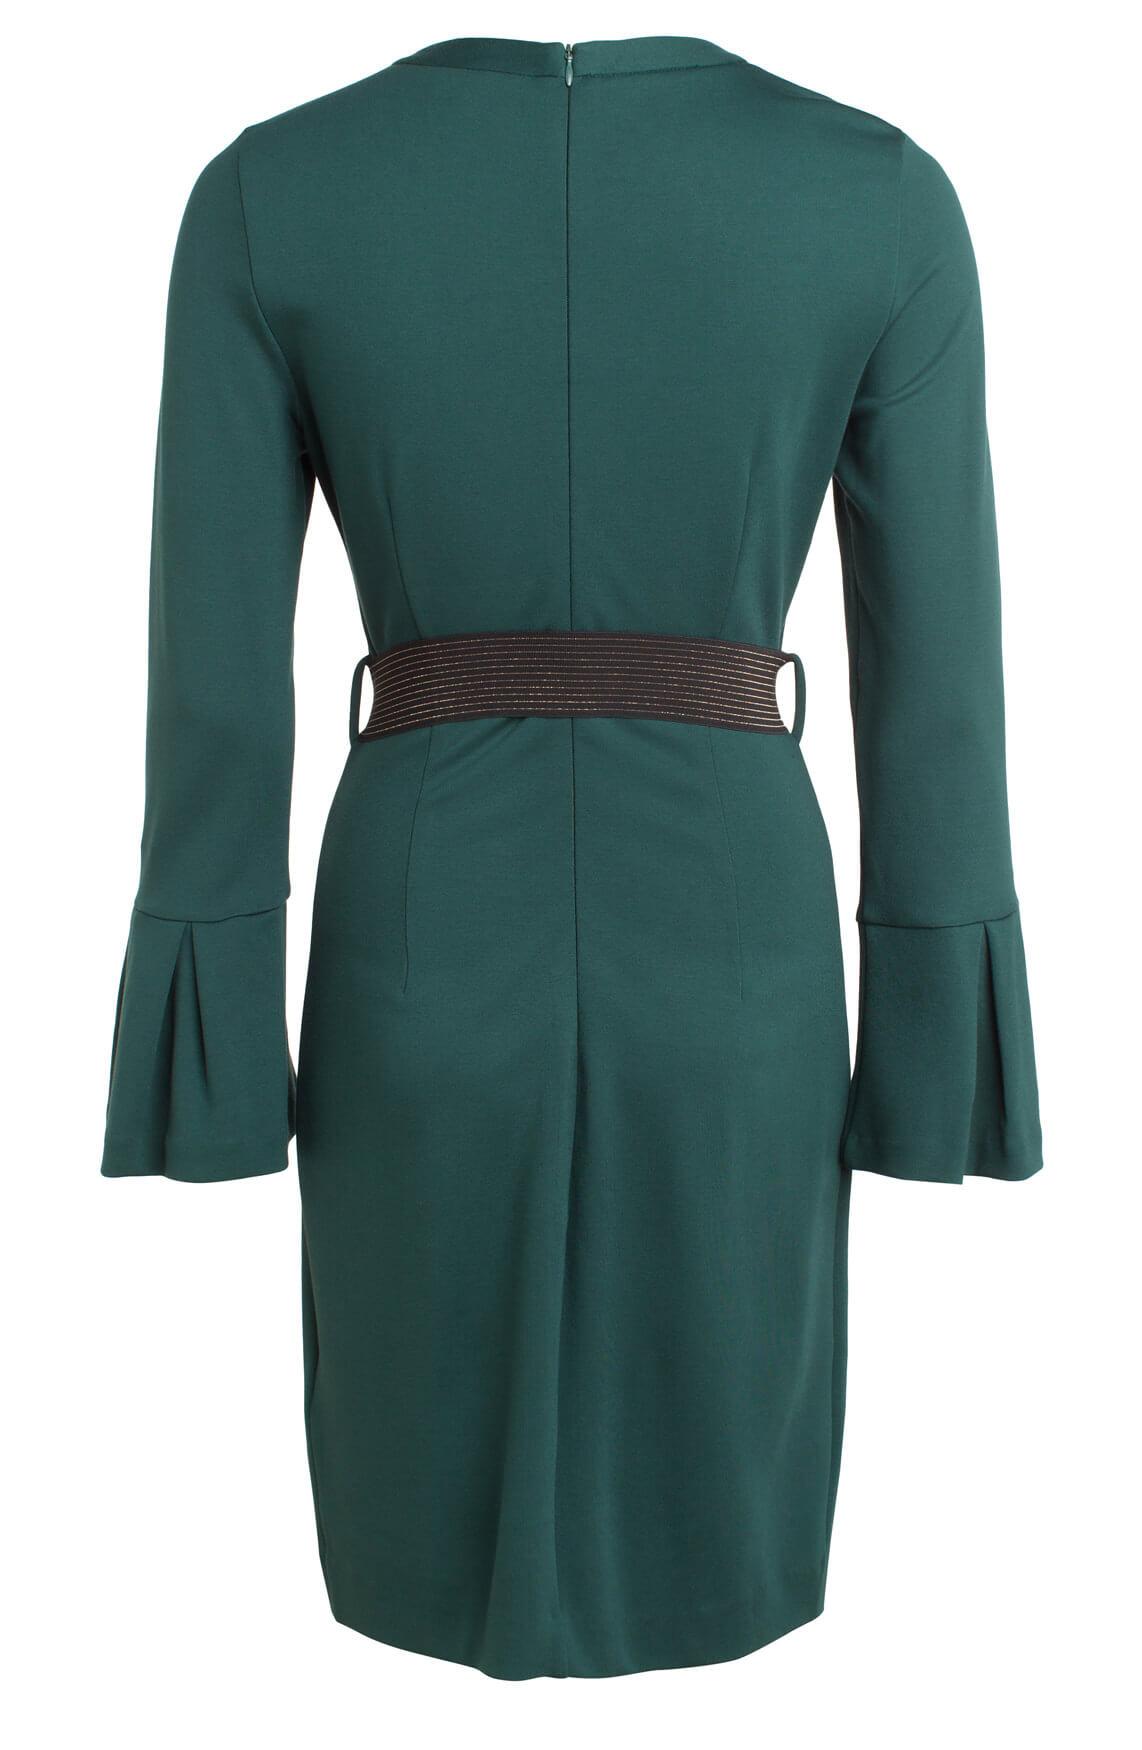 Kocca Dames Brasila jurk groen